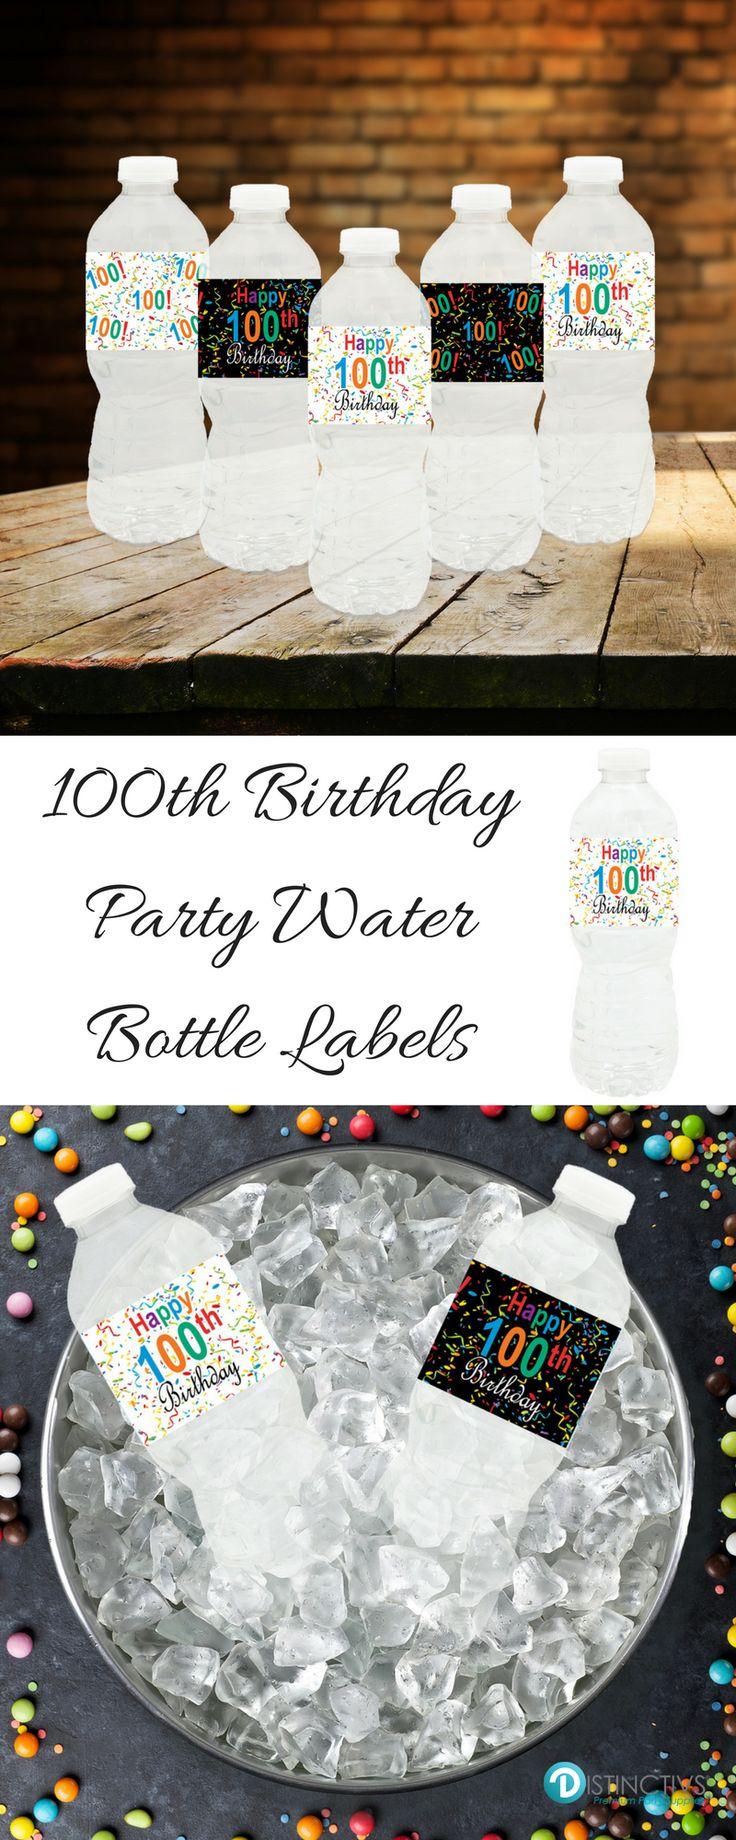 7 Best 100 Birthday Ideas Images On Pinterest